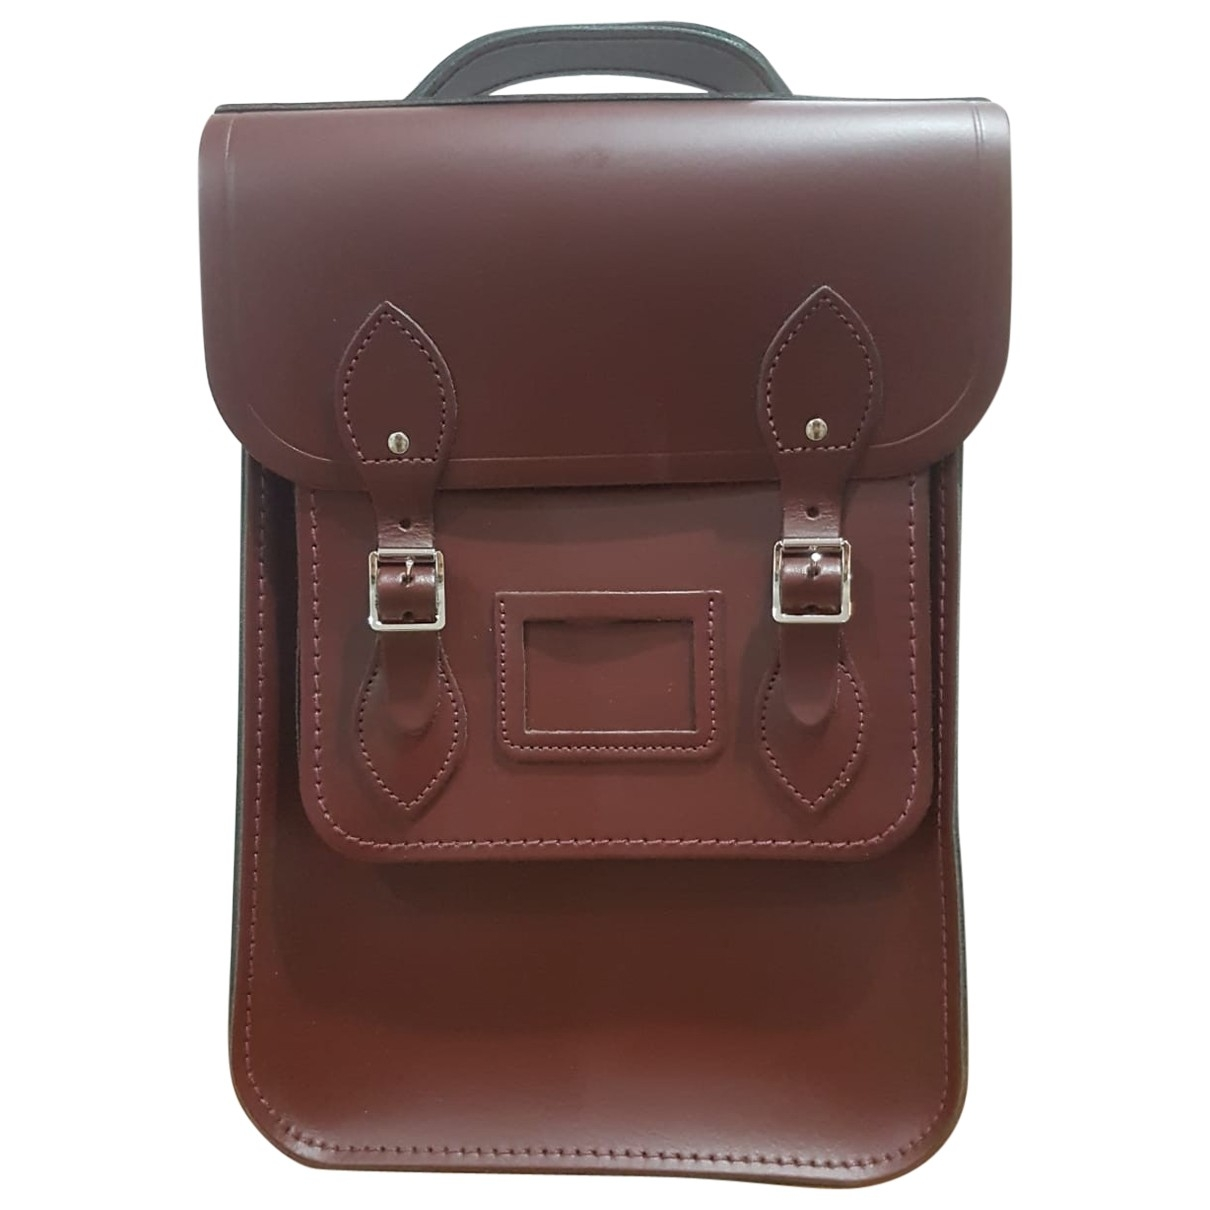 Cambridge Satchel Company \N Burgundy Leather backpack for Women \N